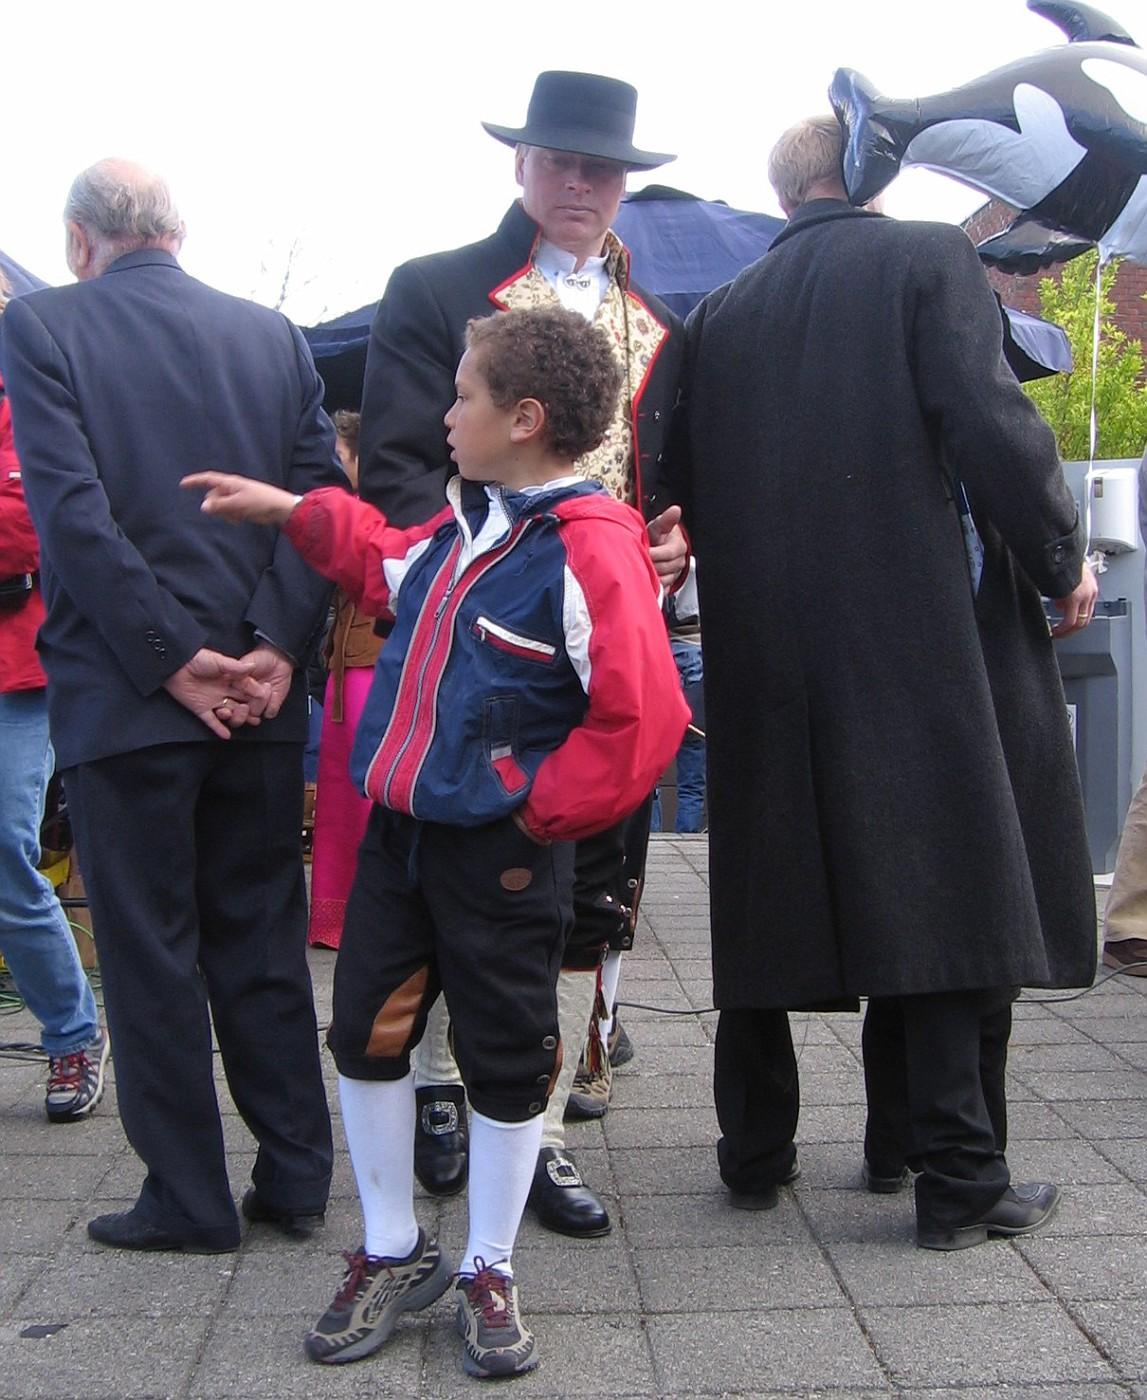 fotballdrakte norge